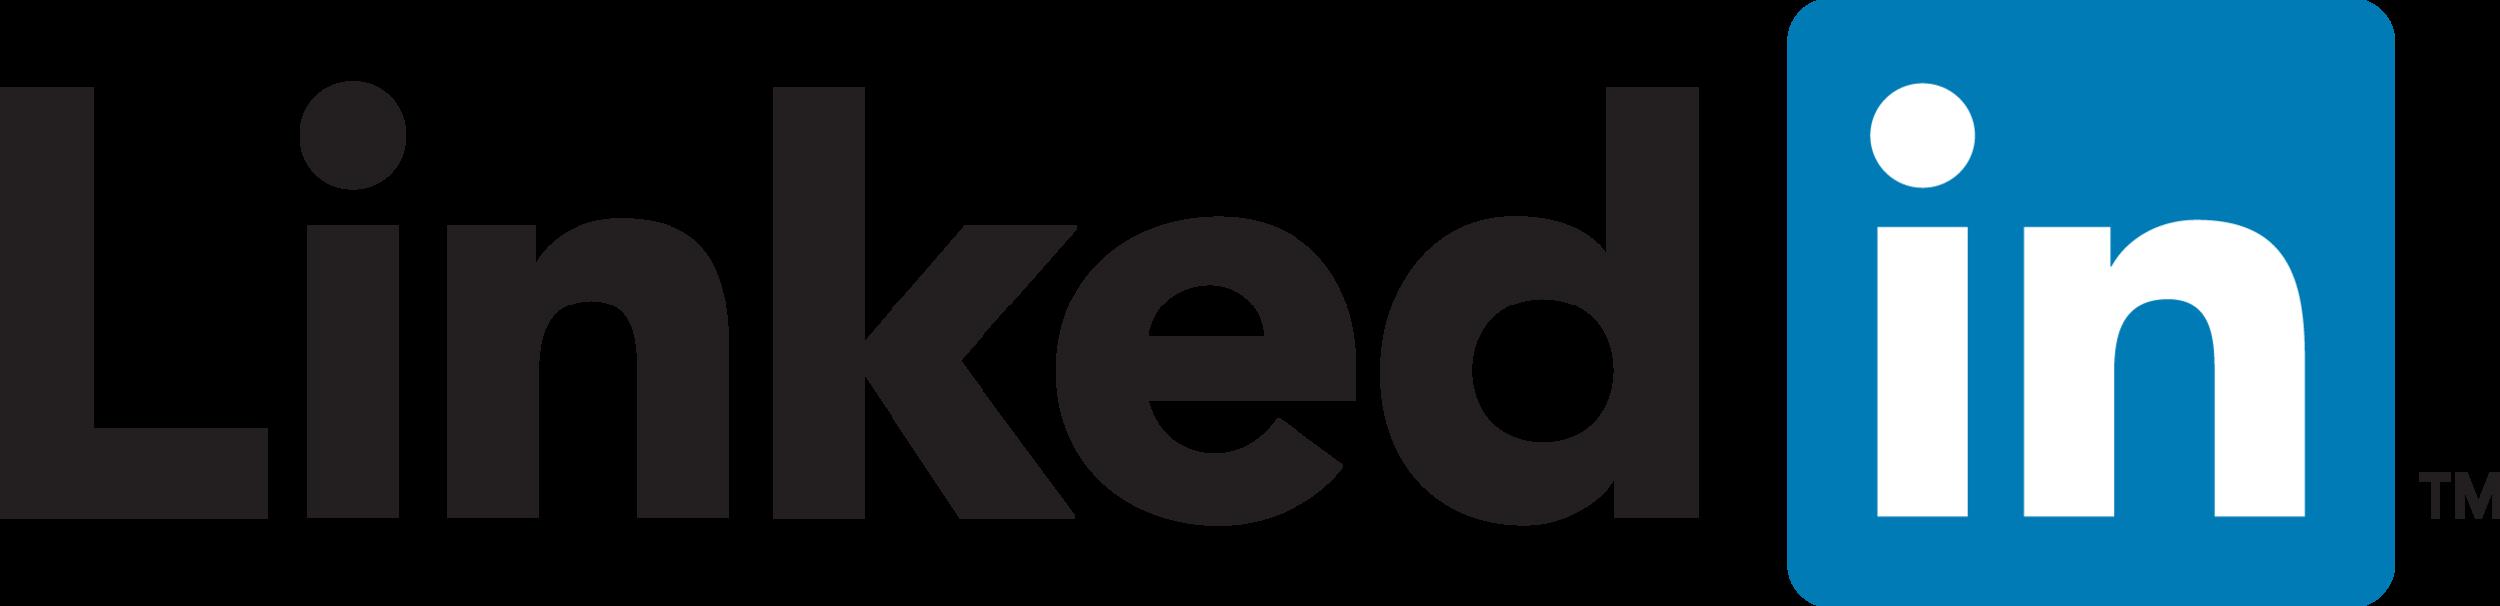 LinkedIn-Logo-2C (1).png